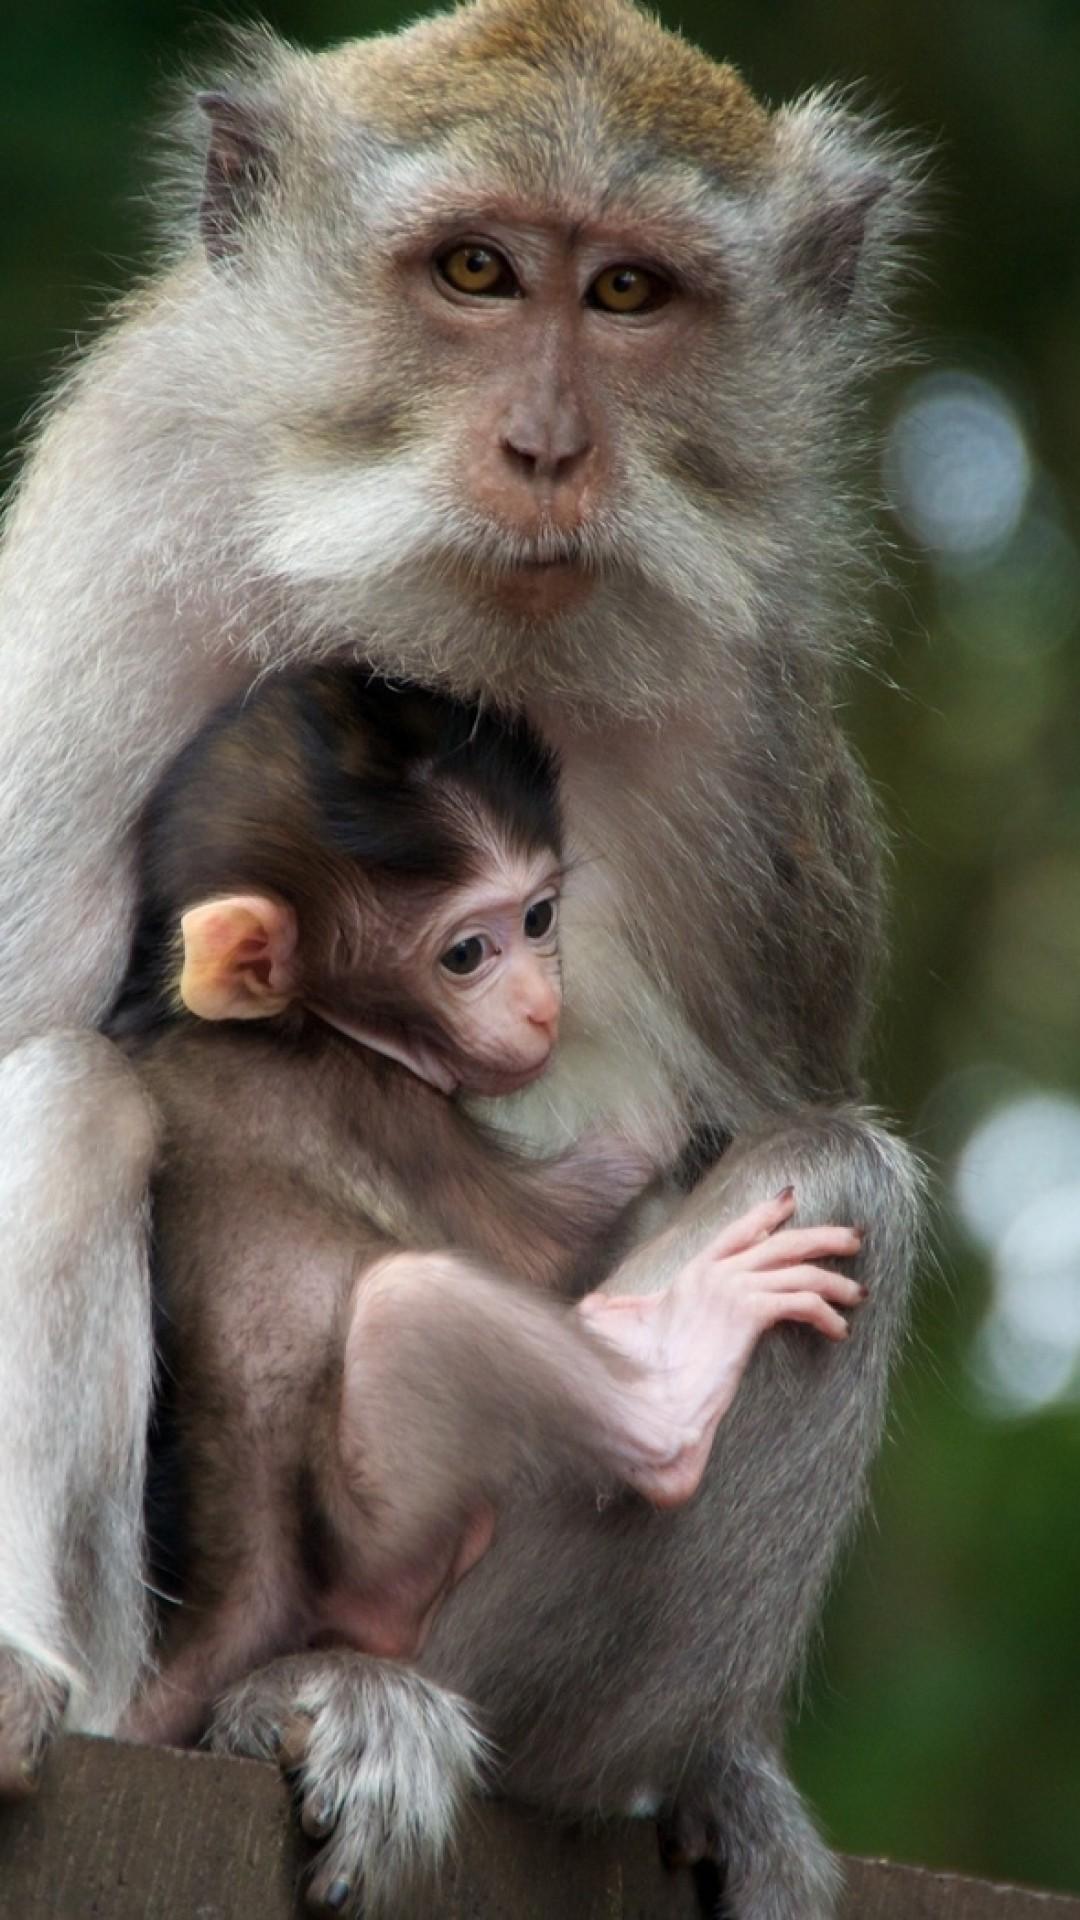 Wallpaper monkey, family, baby, care, tenderness